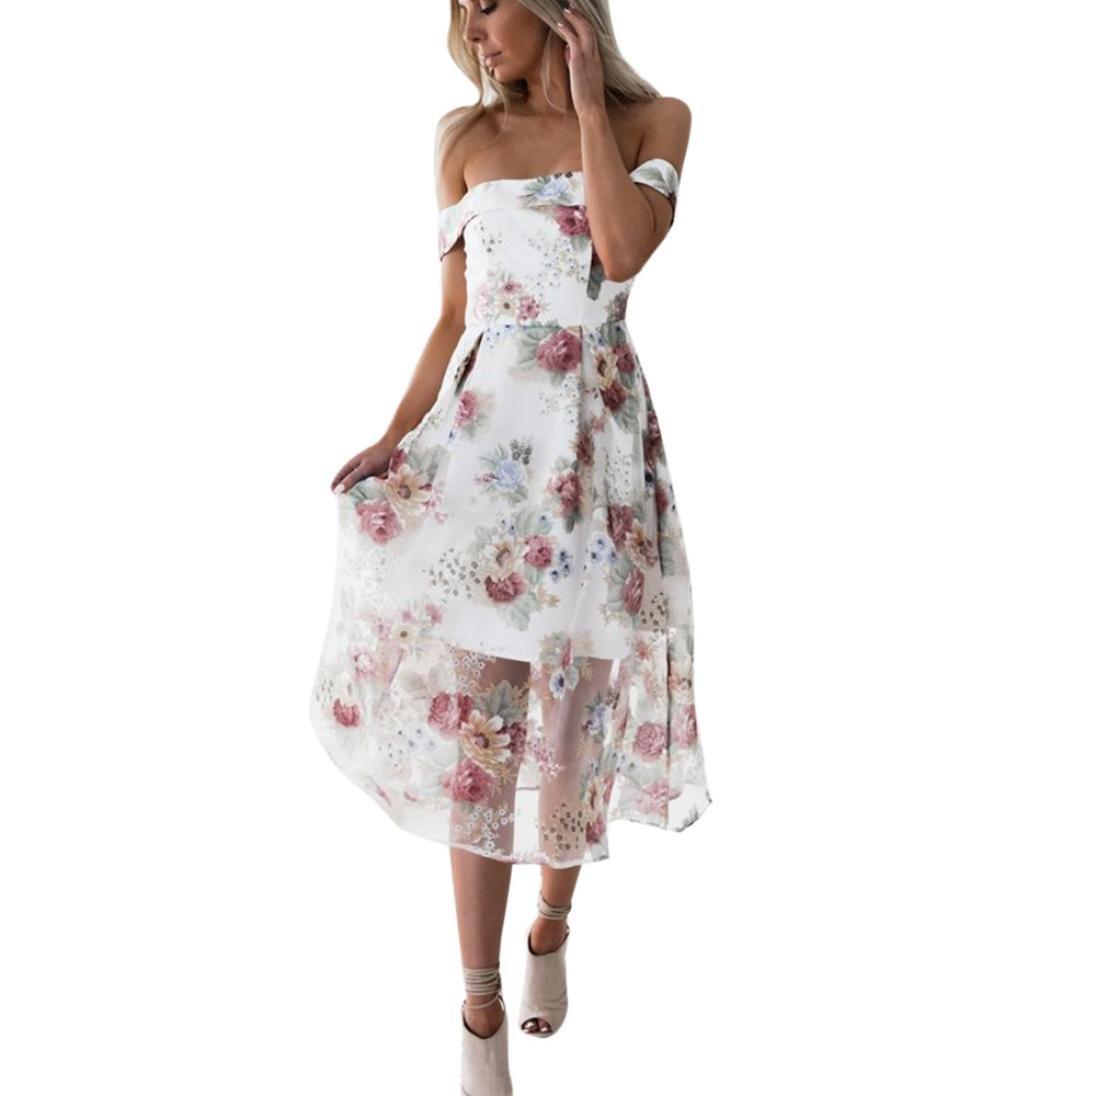 00d8c1e328e4e Amazon.com: Scaling Women Dress,Hot Sale! Women Summer Off Shoulder Floral  Printed Maxi Dress Sundress Bodycon Evening Party Dress: Clothing